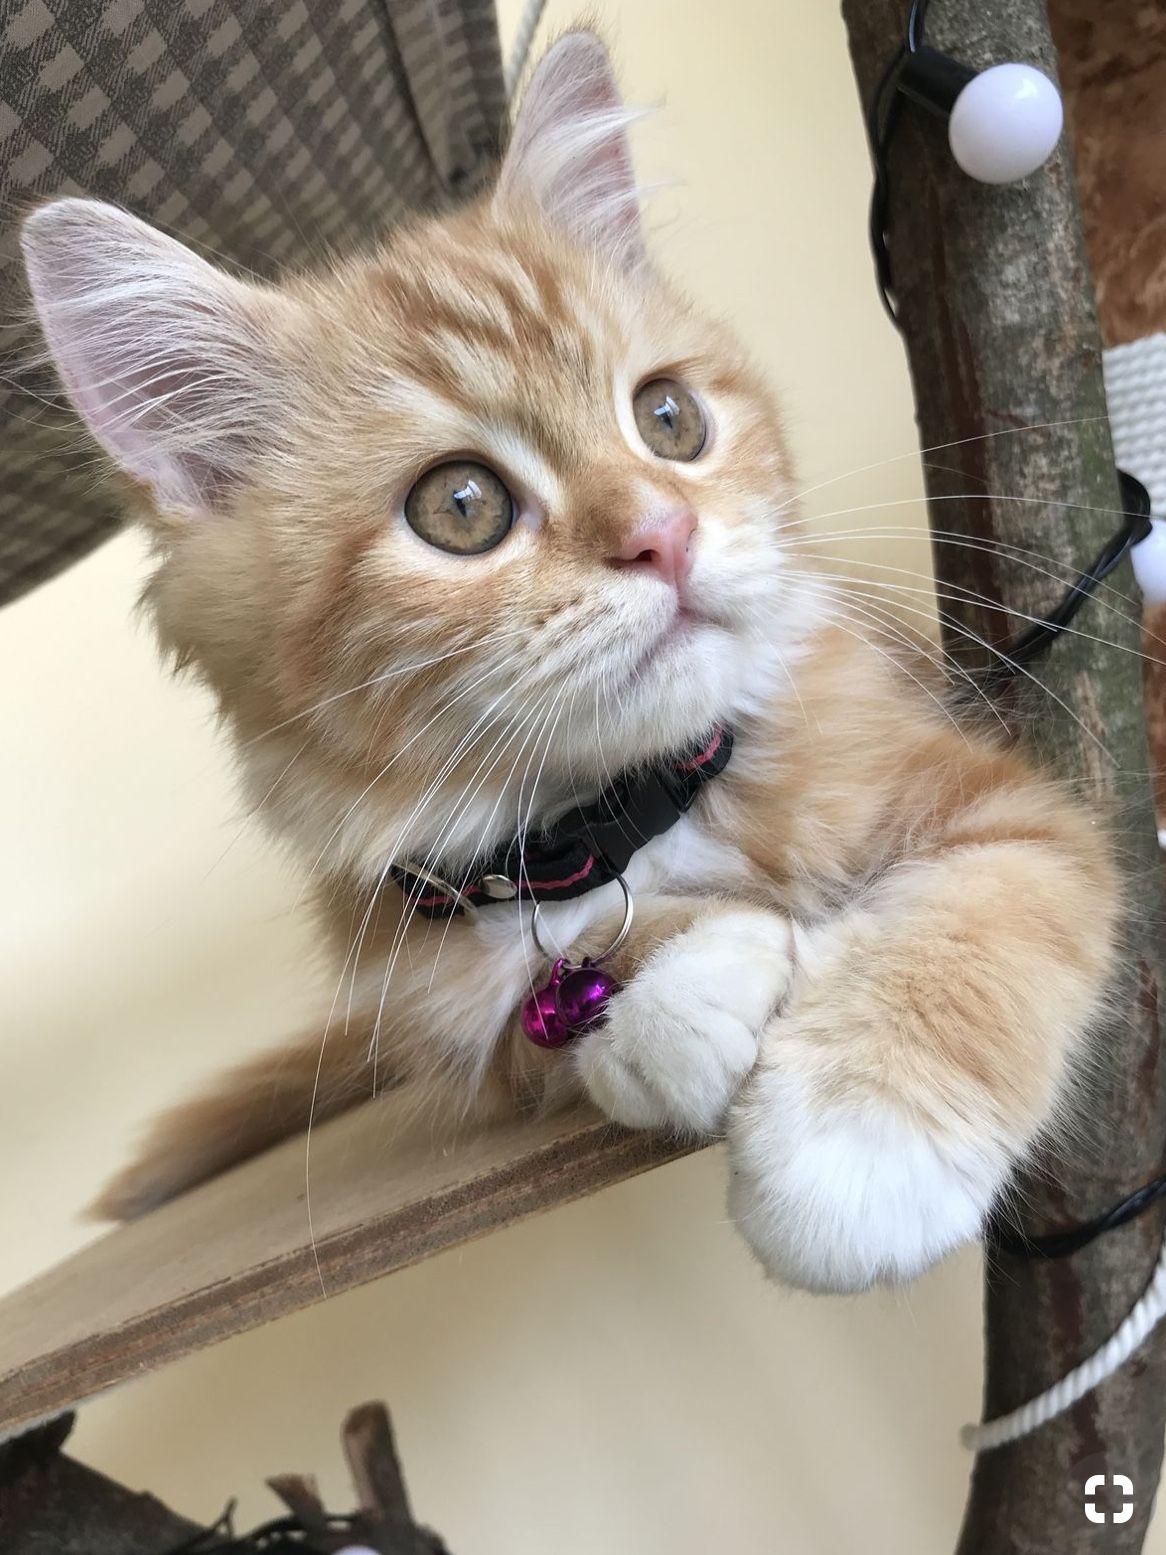 Adorable Orange Kitten Kittens Cutest Cute Cats Cute Cats And Kittens